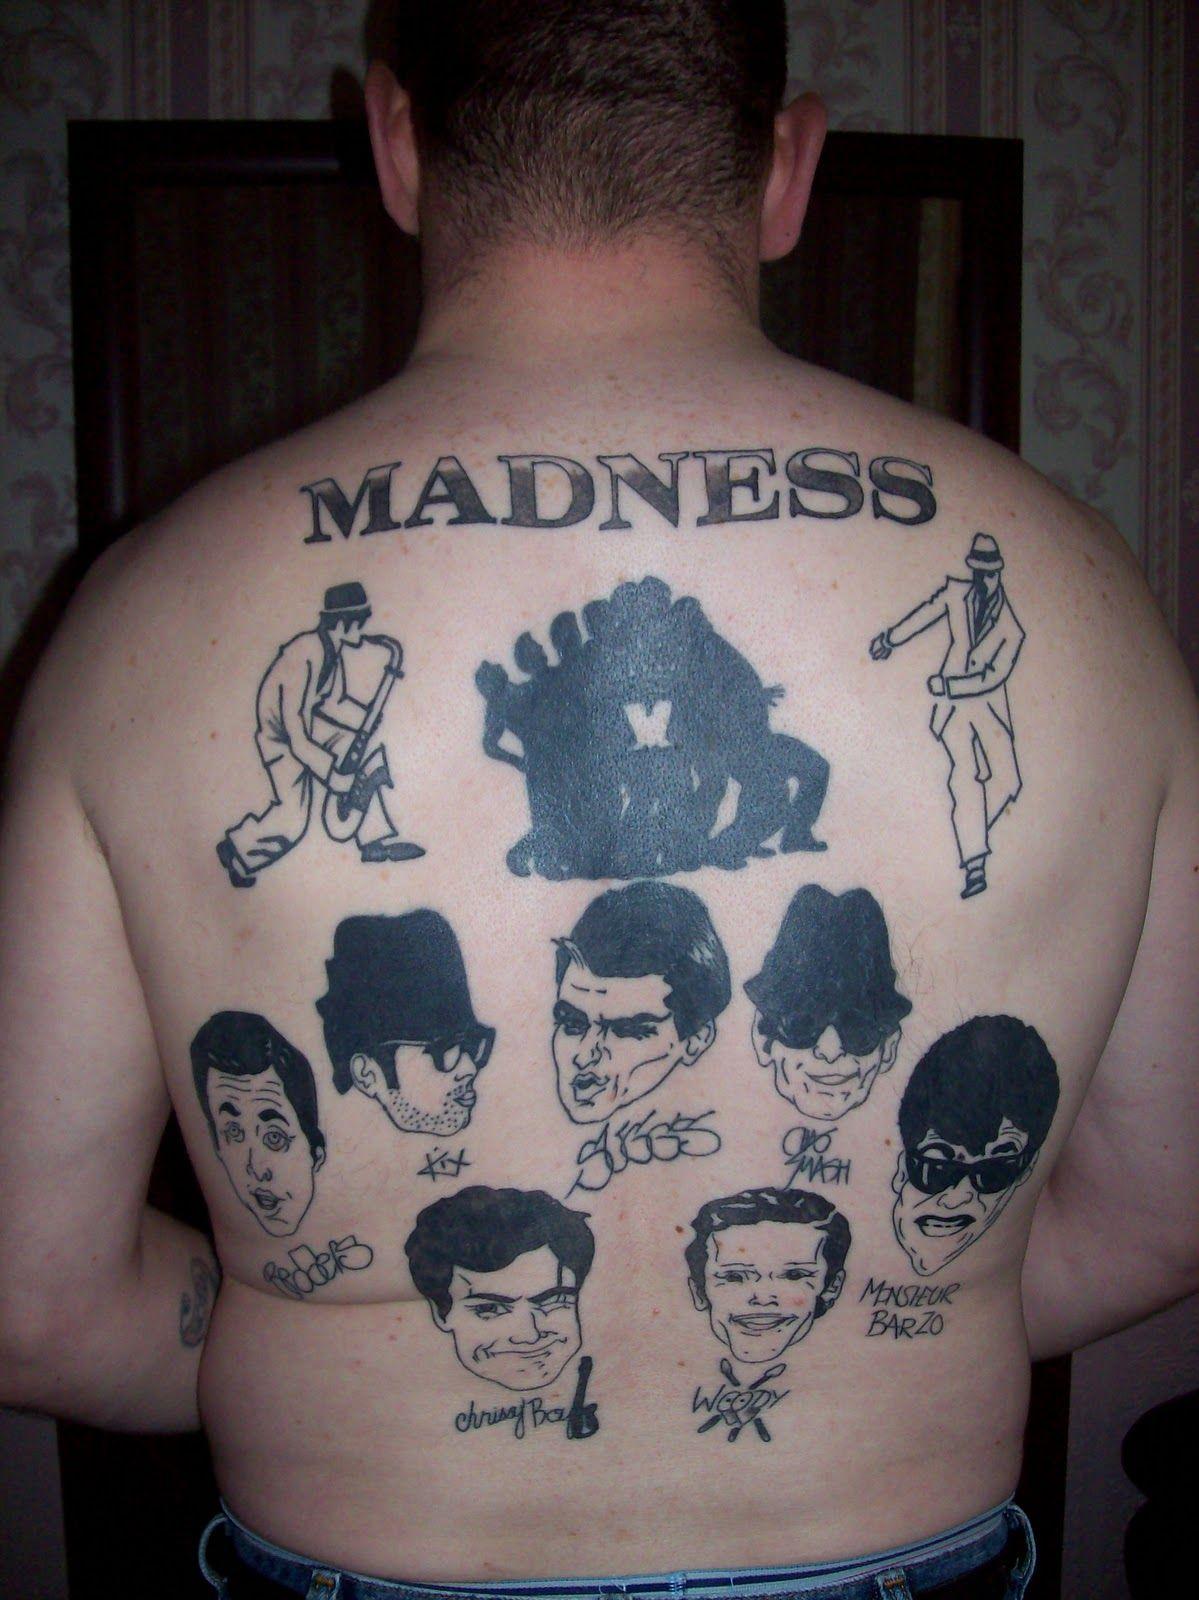 2 Tone Tattoo : tattoo, Tattoos, Ideas, Tattoos,, Tones,, Music